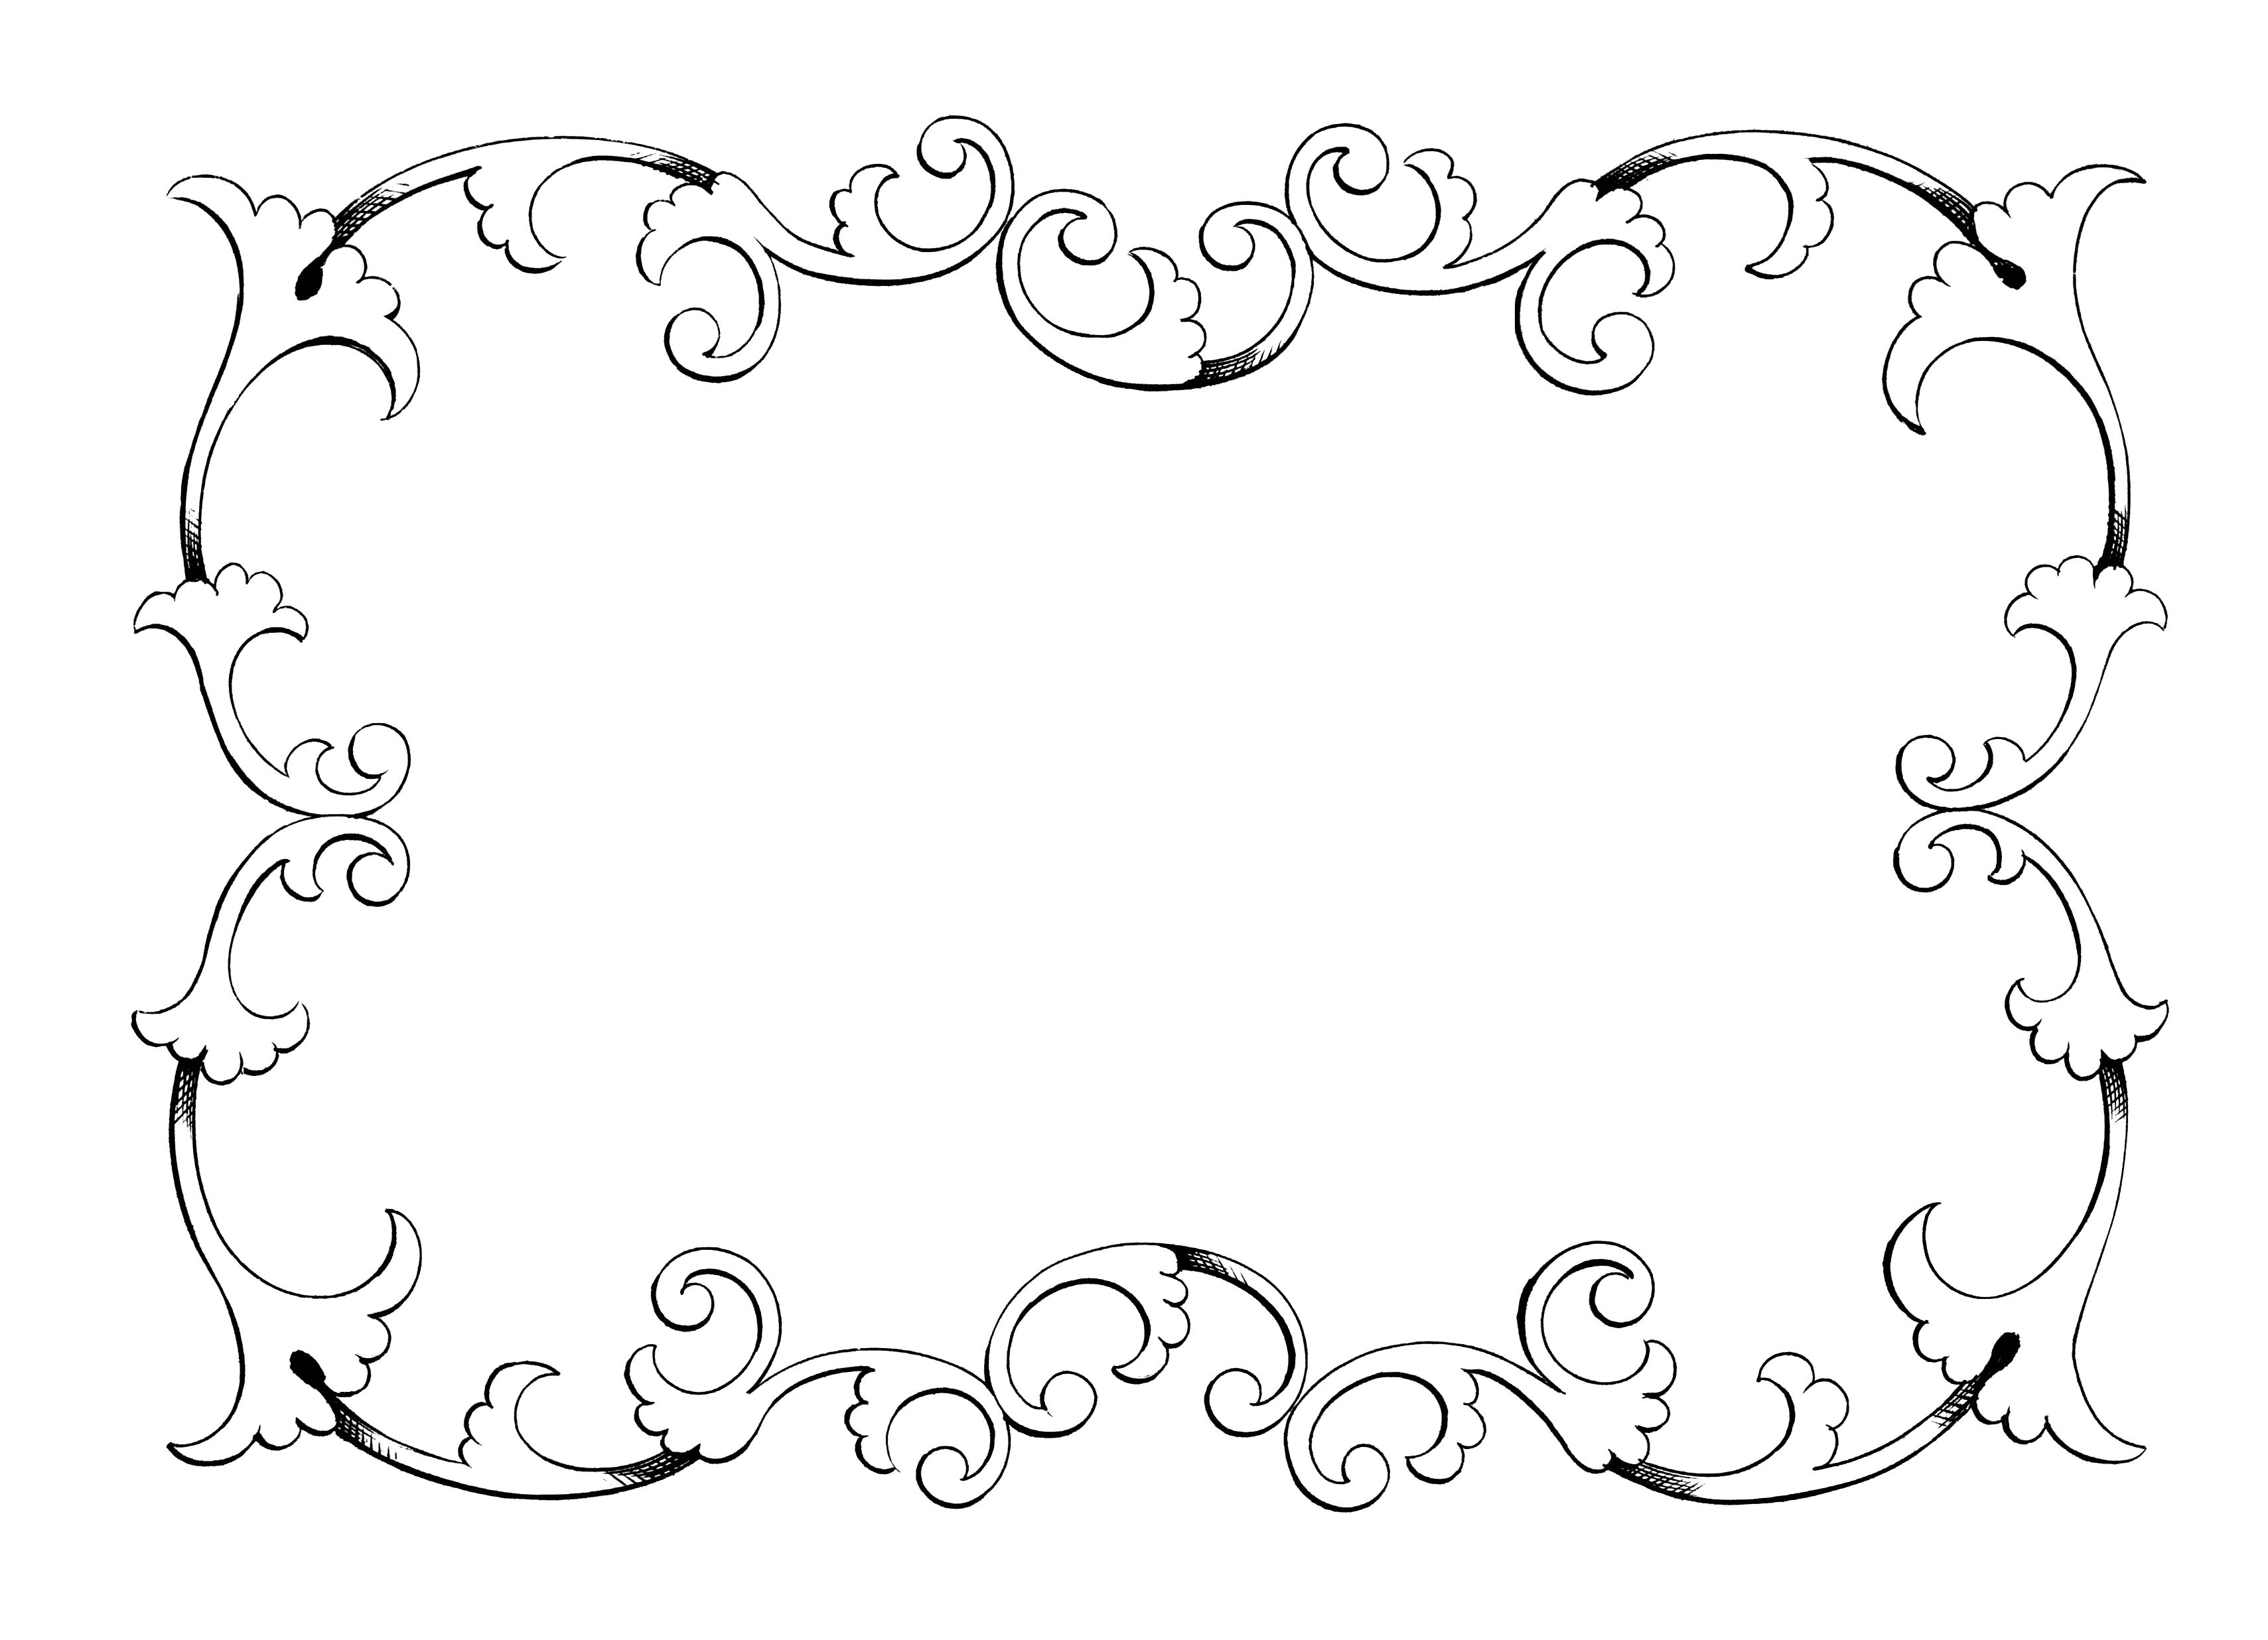 Clipart frames free caicdvrlistscom 3